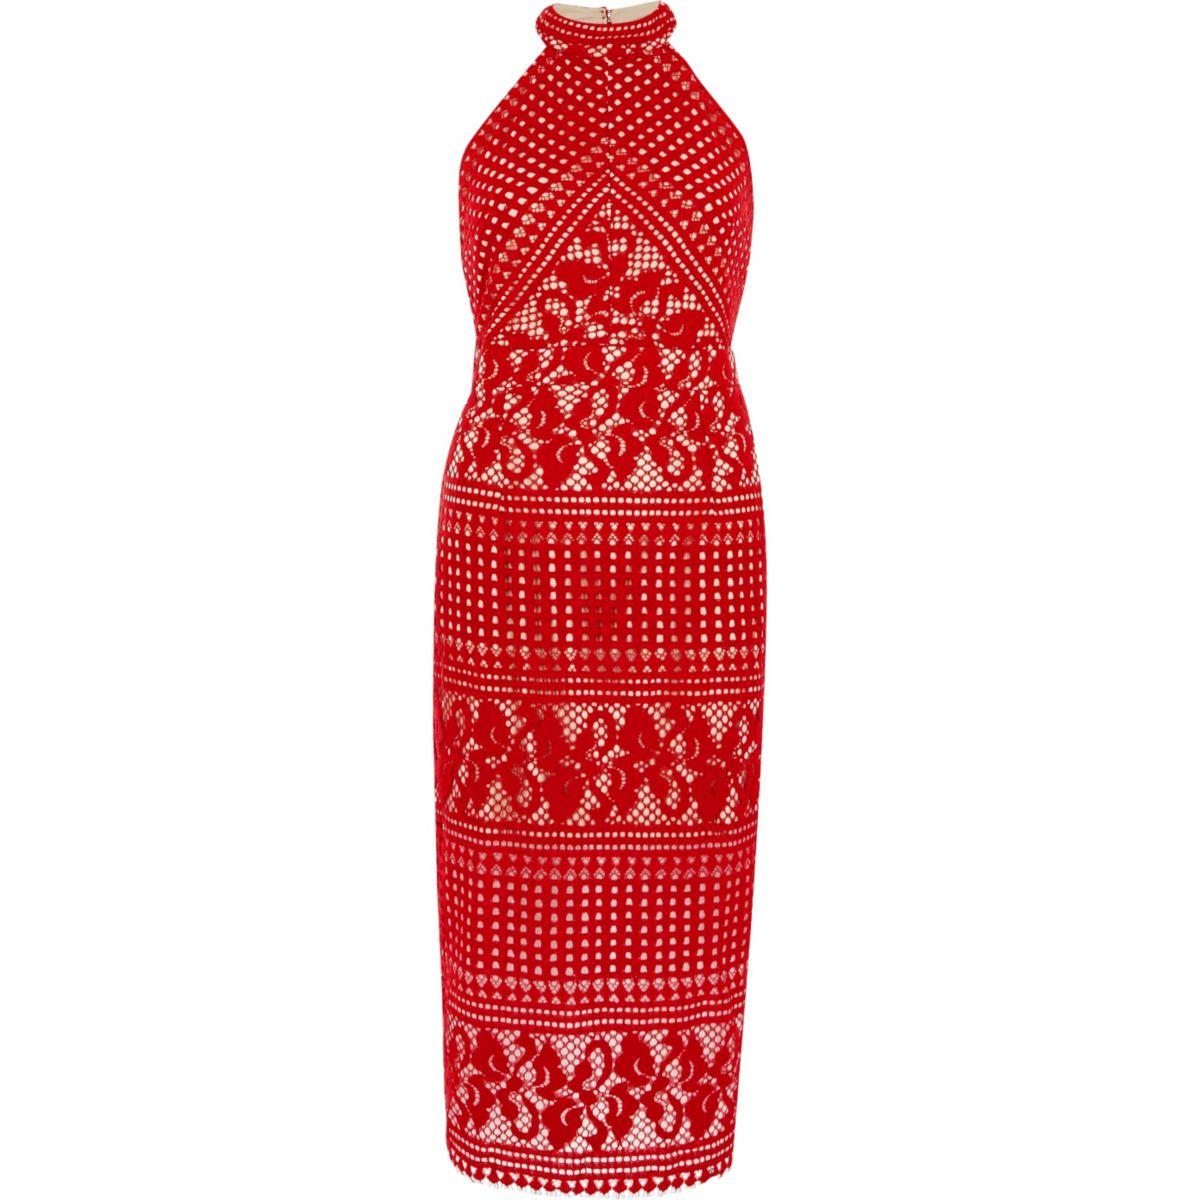 Red lace high neck midi bodycon dress